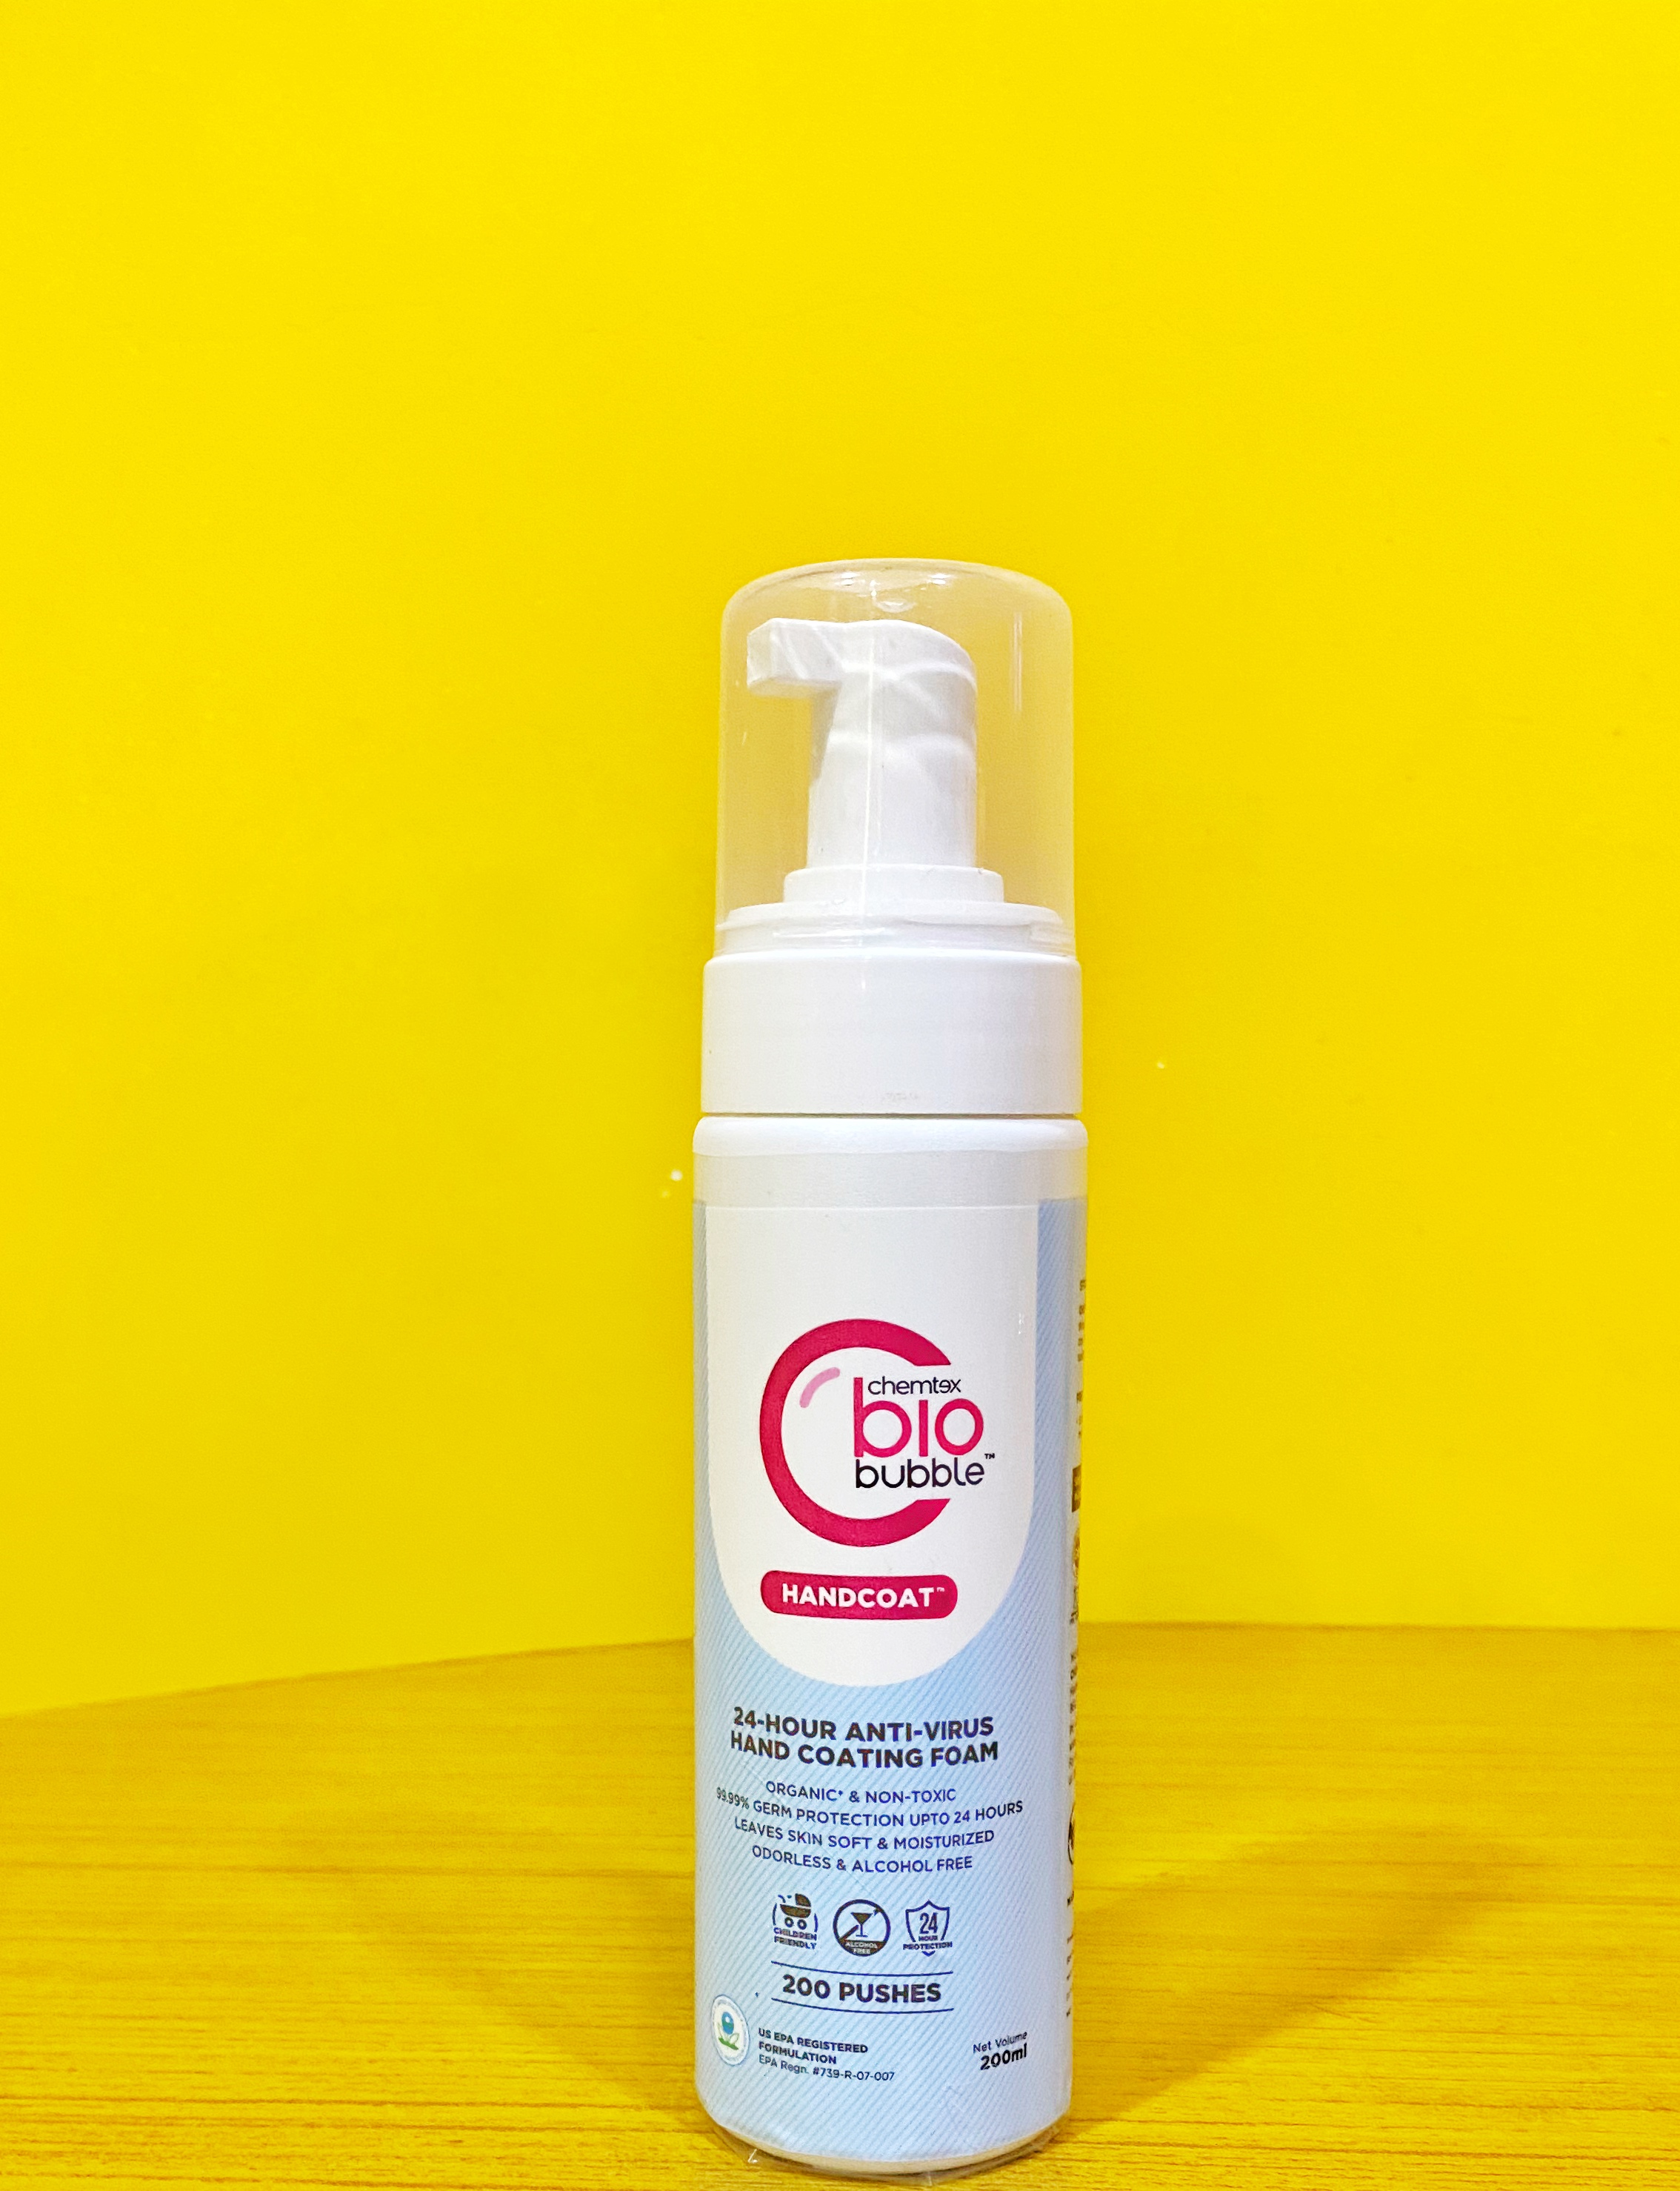 Chemtext BioBubble HandCoat-Child friendly disinfectant foam-By avyukth_n_mamma